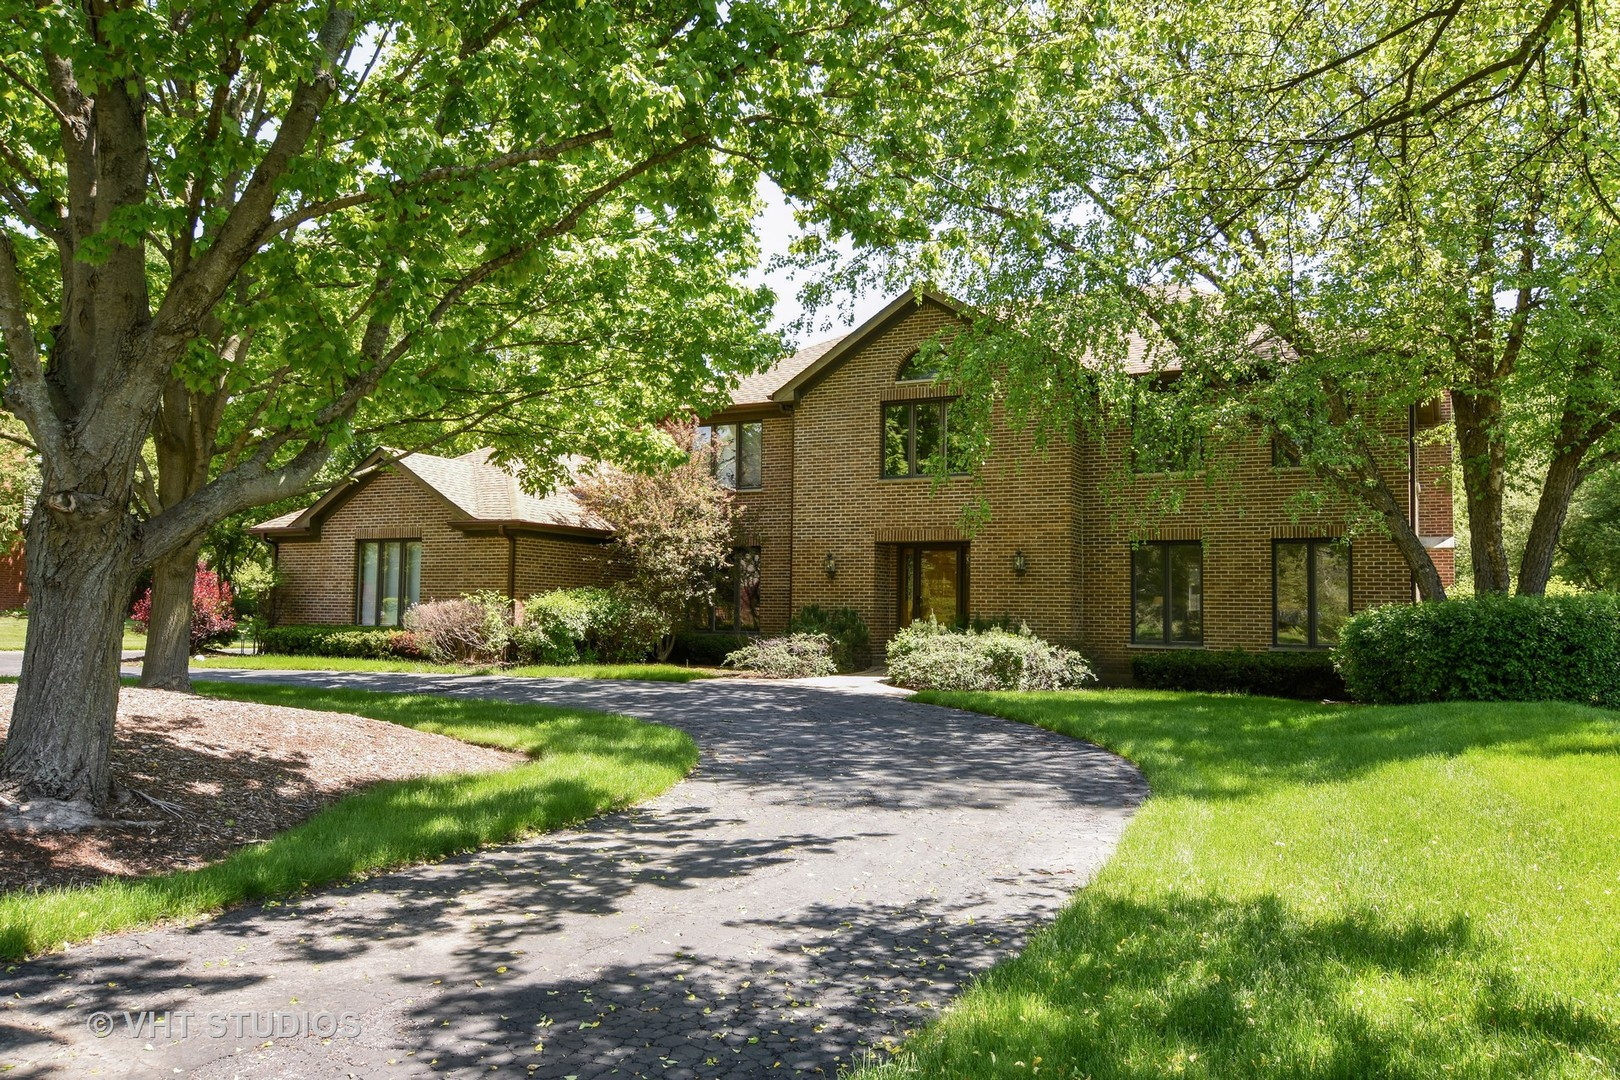 1522 Sumter Court, Long Grove, Illinois 60047